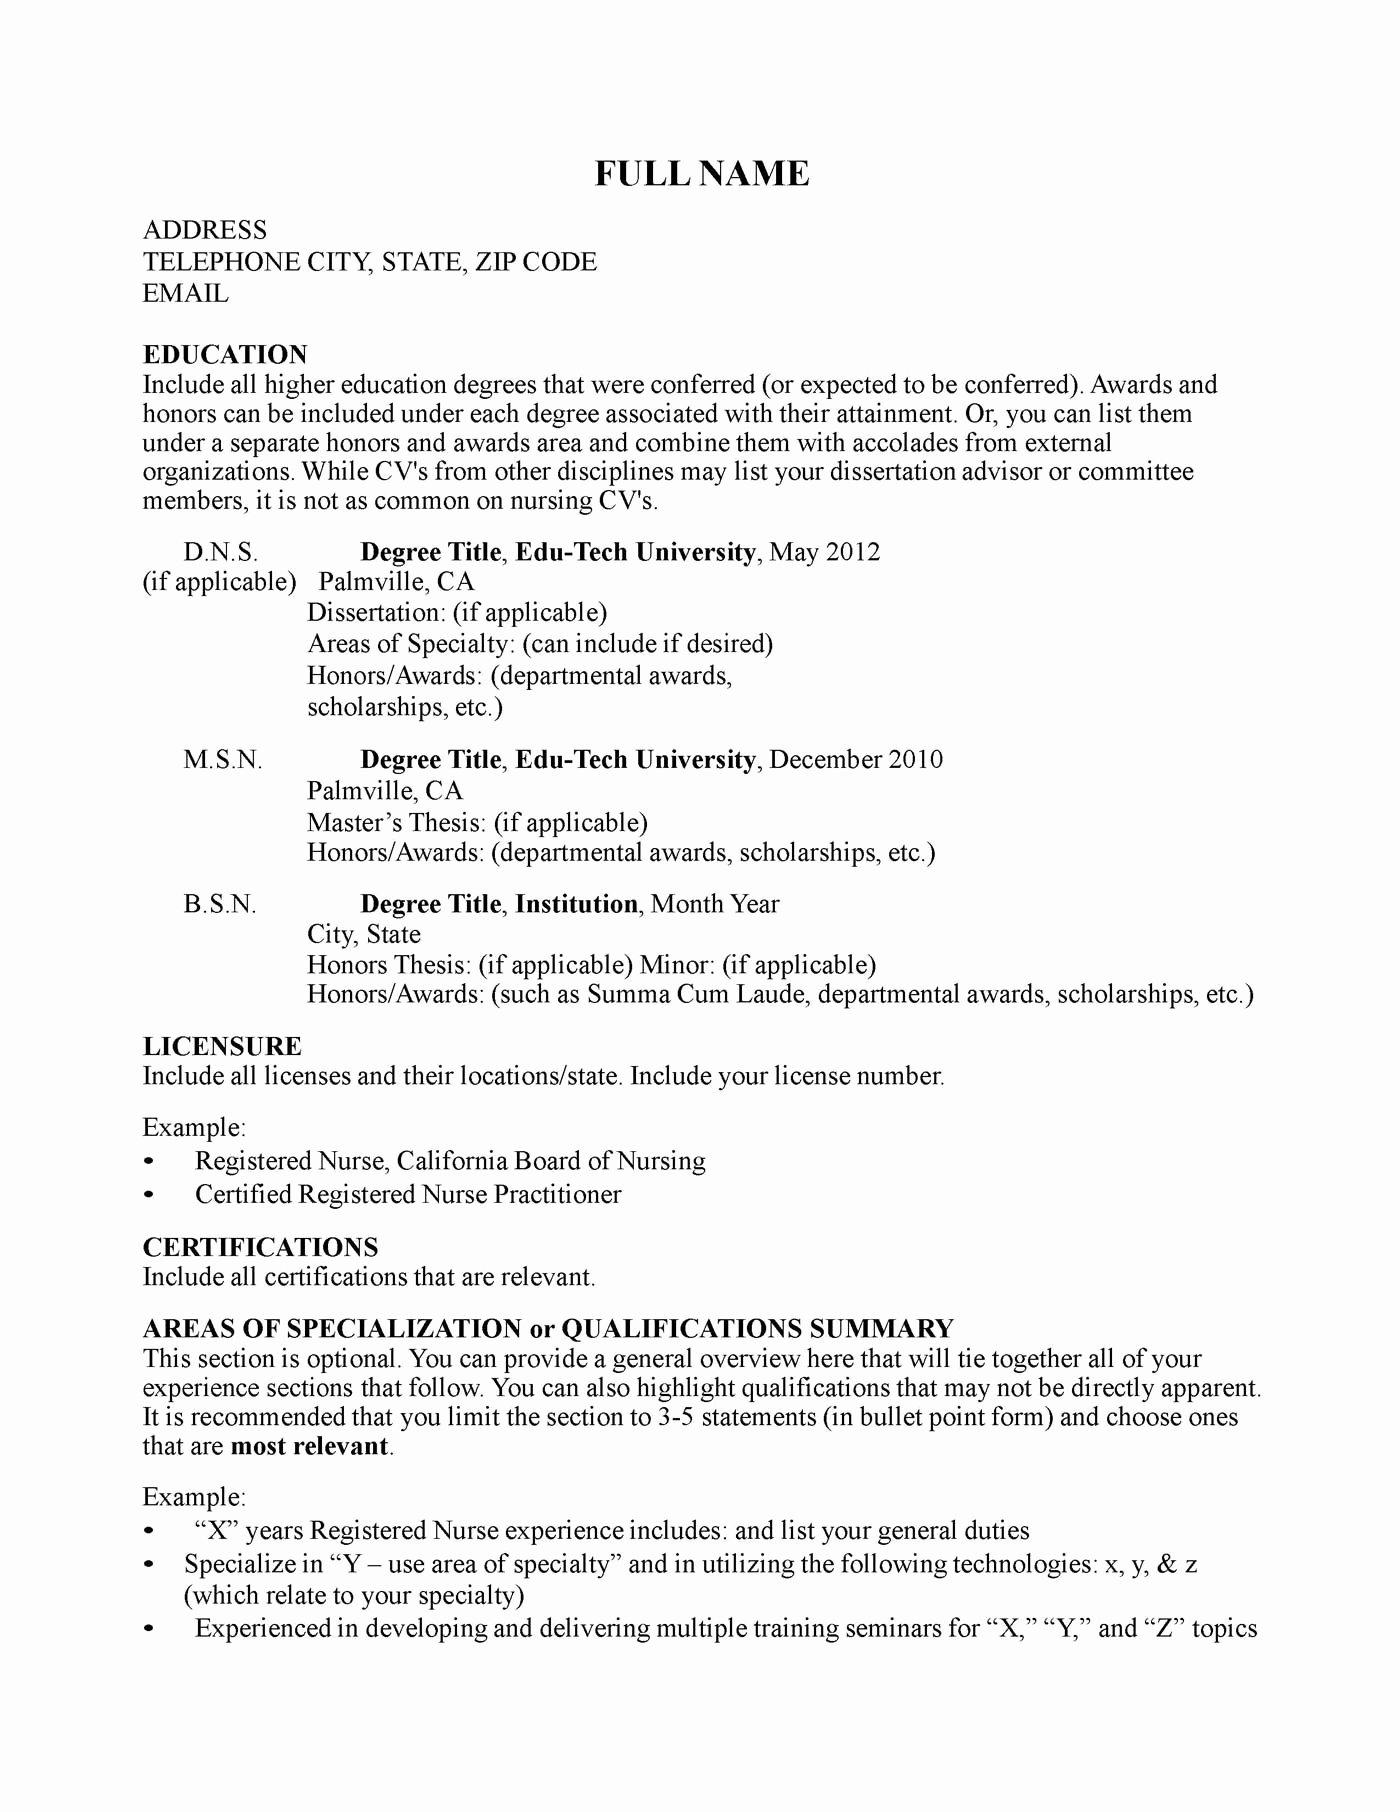 Curriculum Vitae Curriculum Vitae Sample Nurse Educator